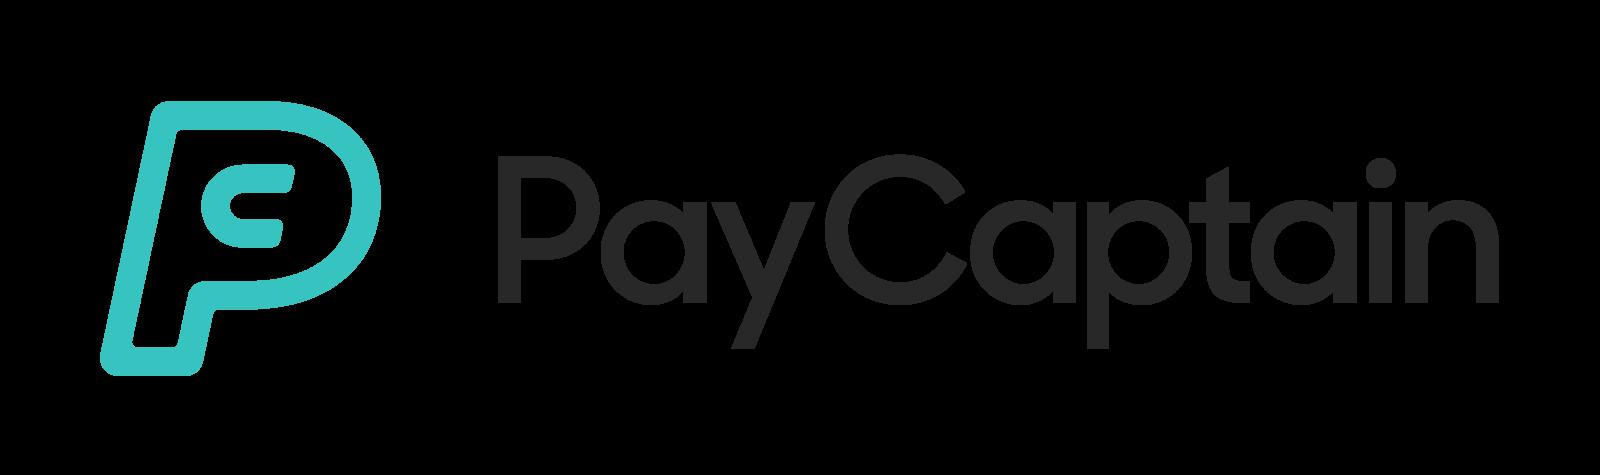 PayCaptain logo